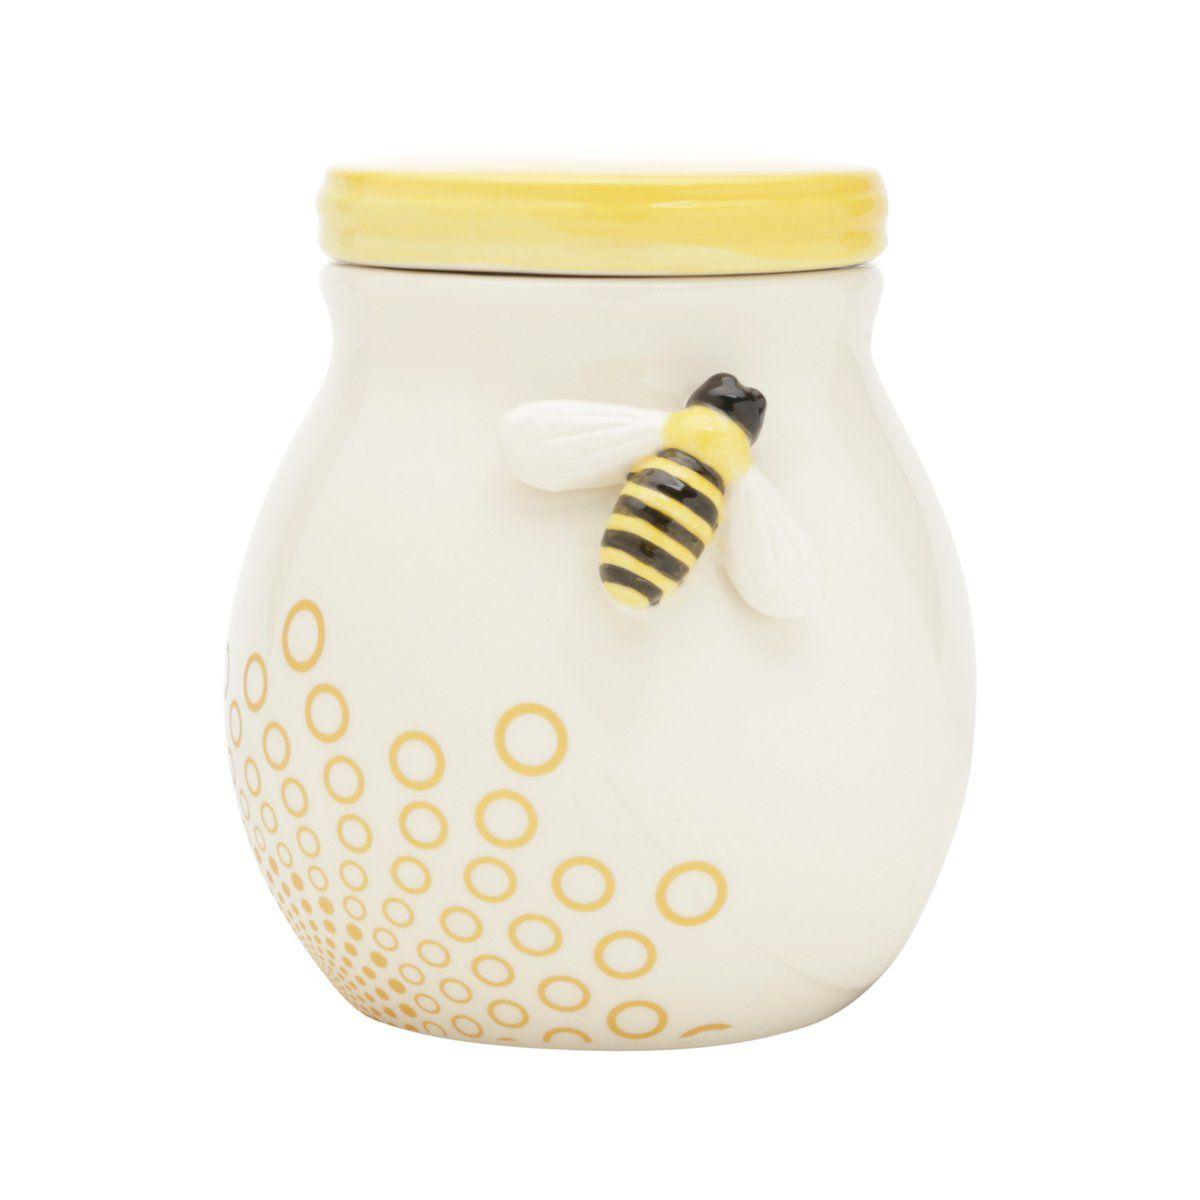 Pote decorativo 14,8 cm de cerâmica branca e amarela Abelha Lyor - L64017